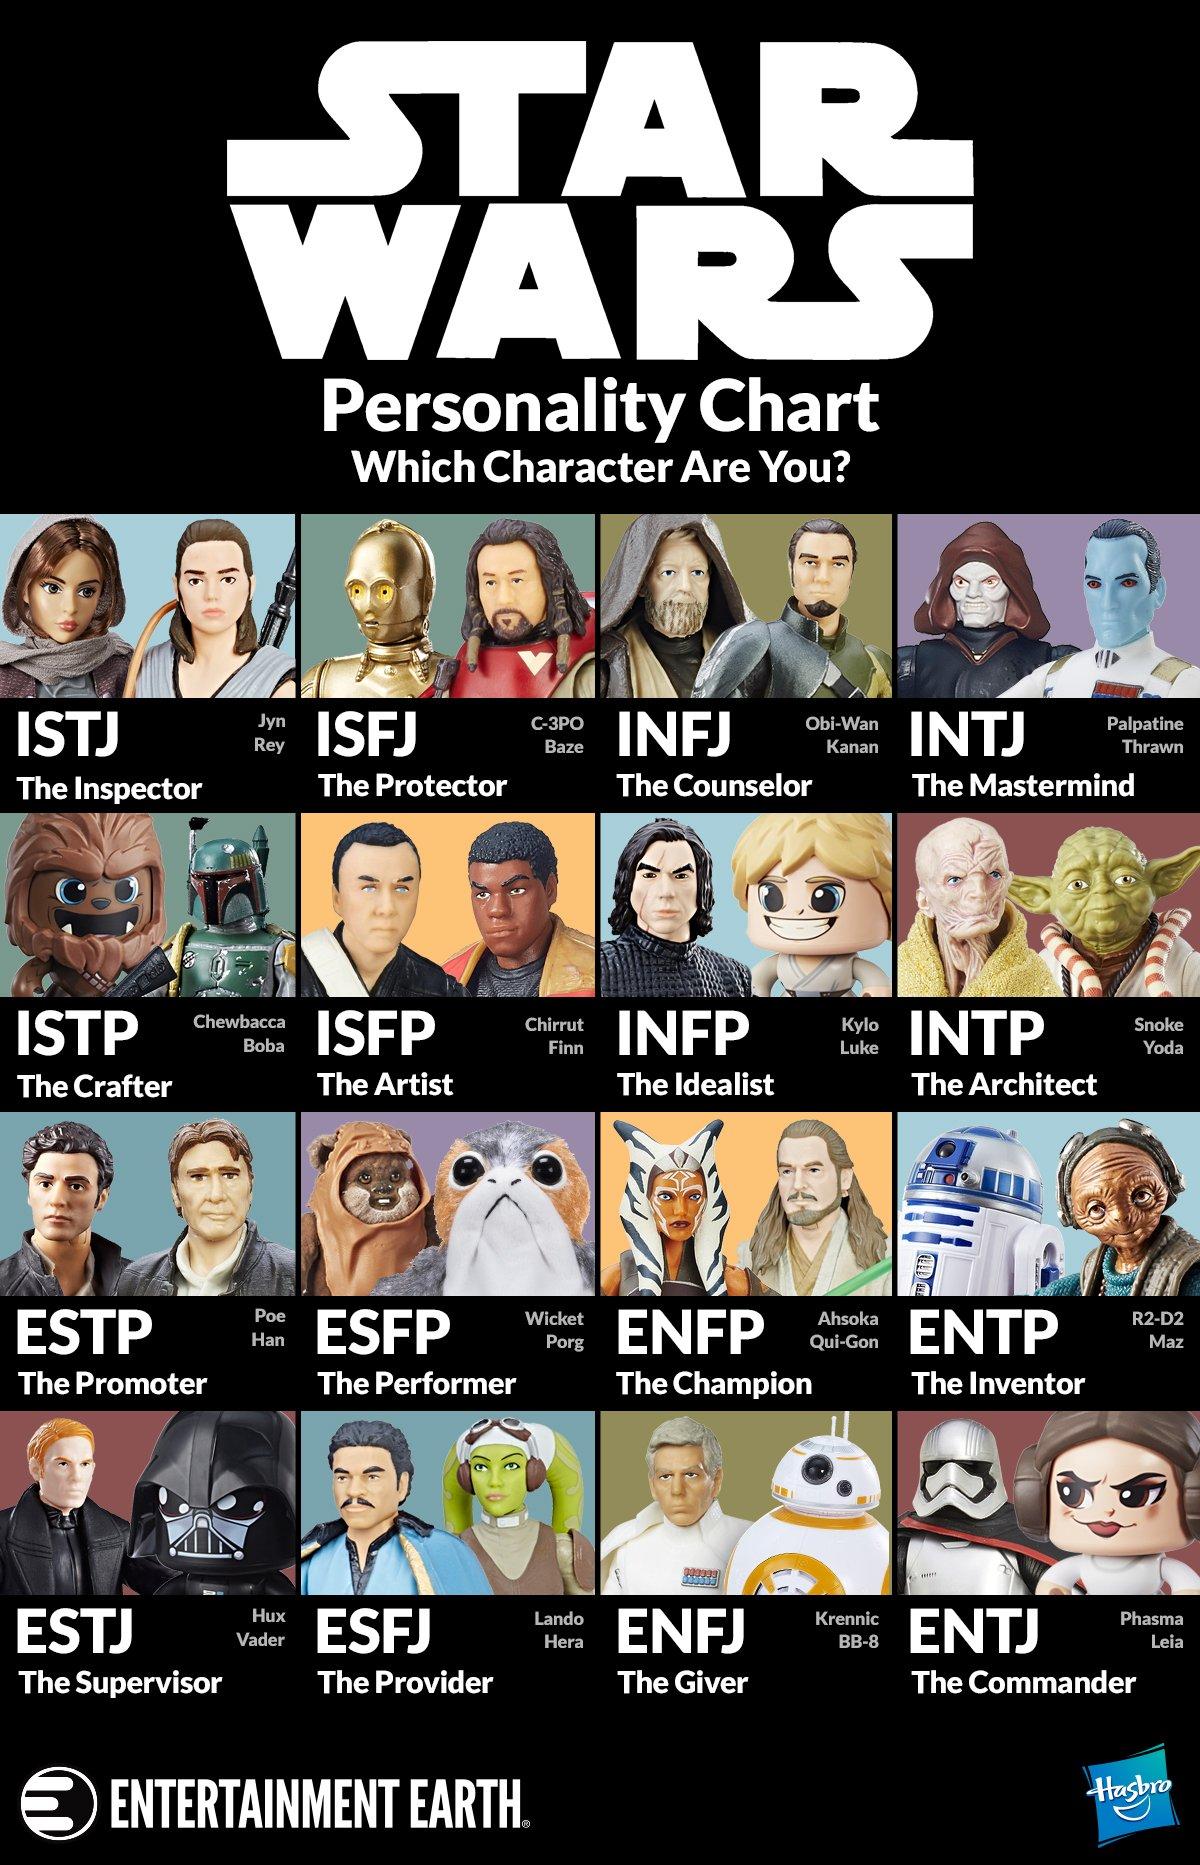 Star Wars Character Personality Chart